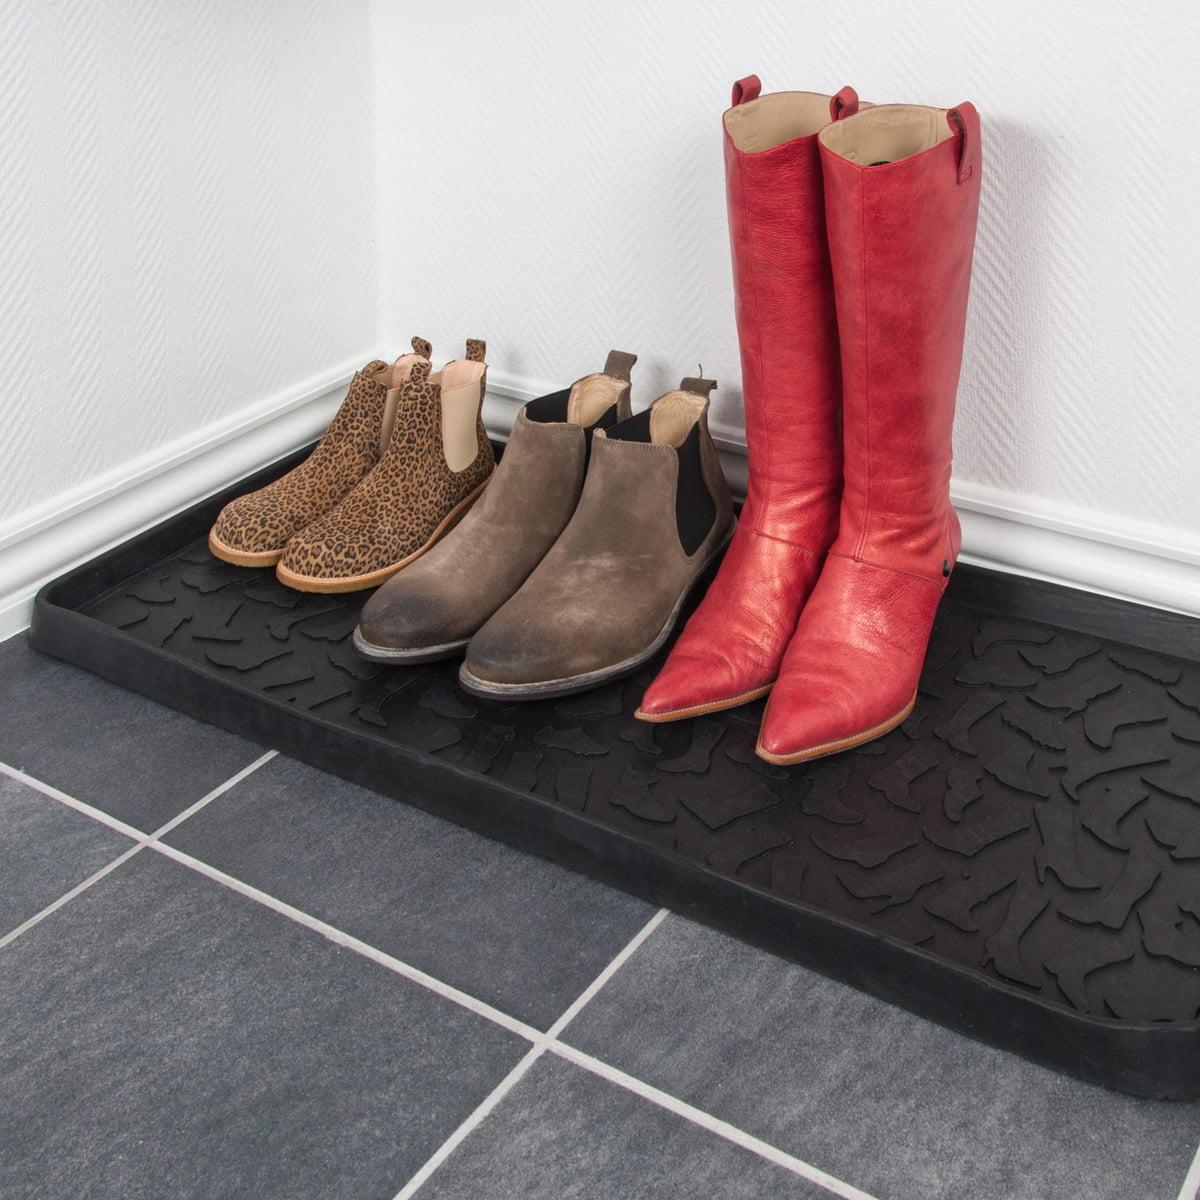 shoe and boot tray 88 x 38 cm by tica copenhagen